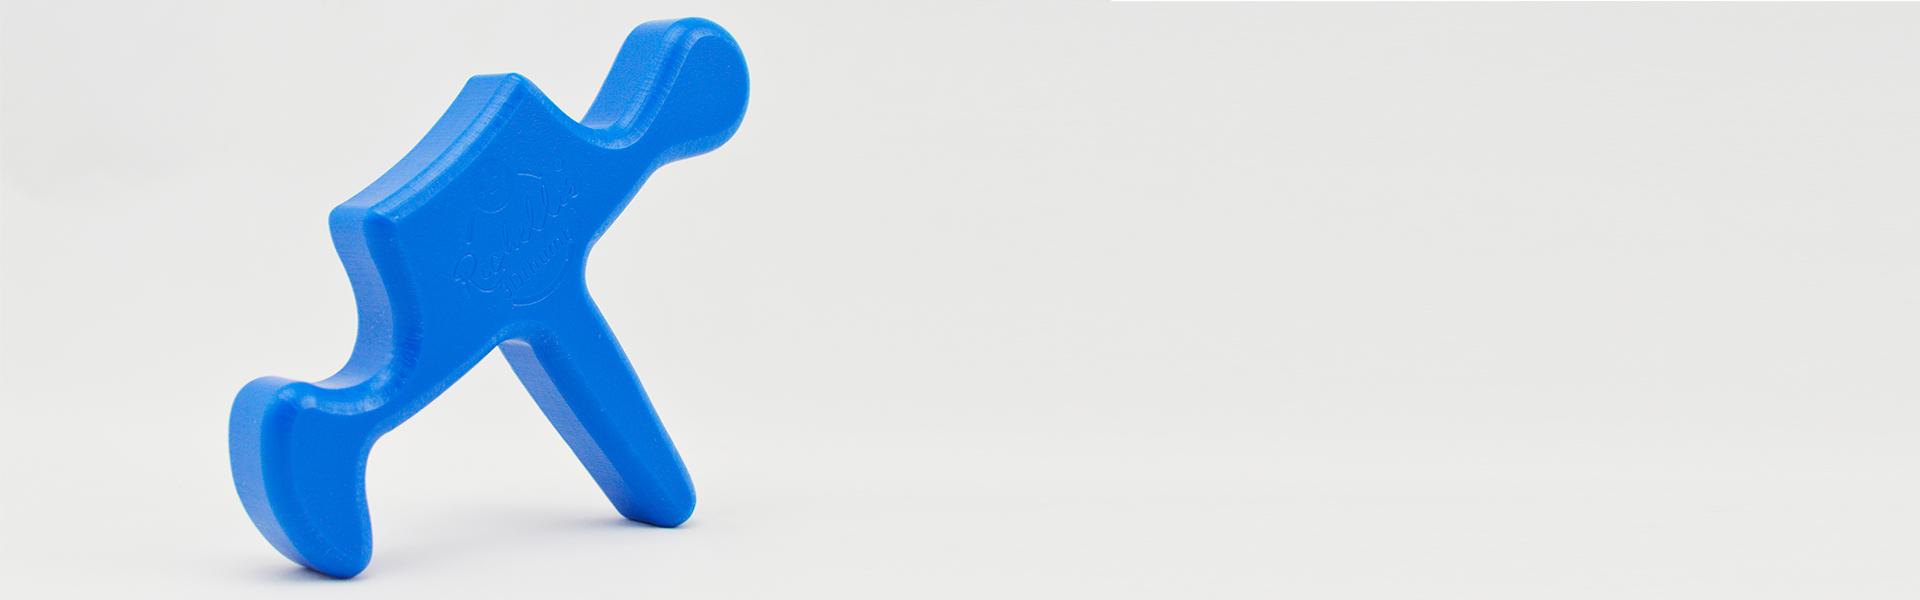 Richelli's 3D Thumb - Herramienta para Fisioterapeuta